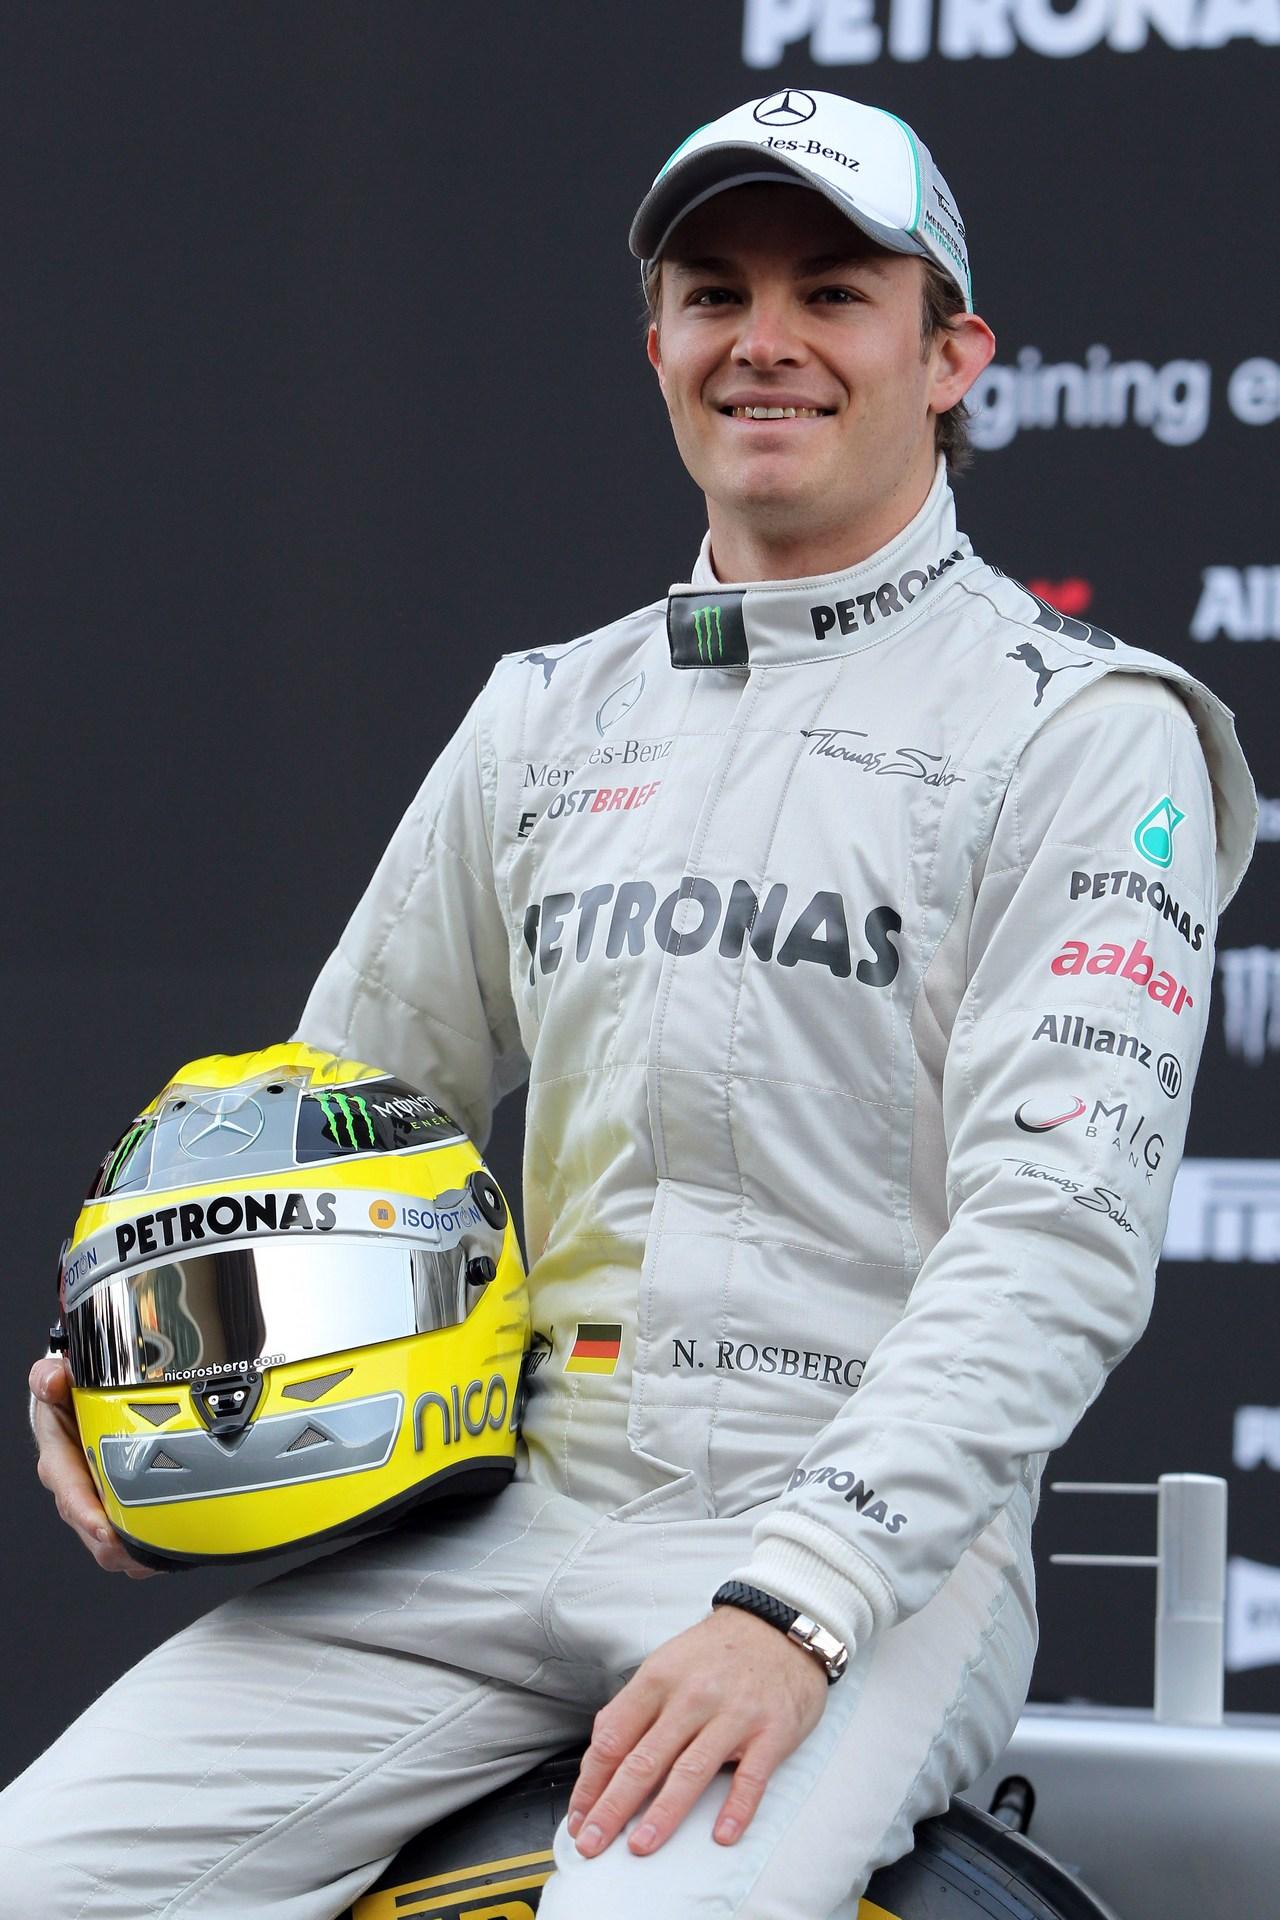 21.02.2012 Barcelona, Spain, Nico Rosberg (GER), Mercedes GP - Mercedes F1 W03 Launch